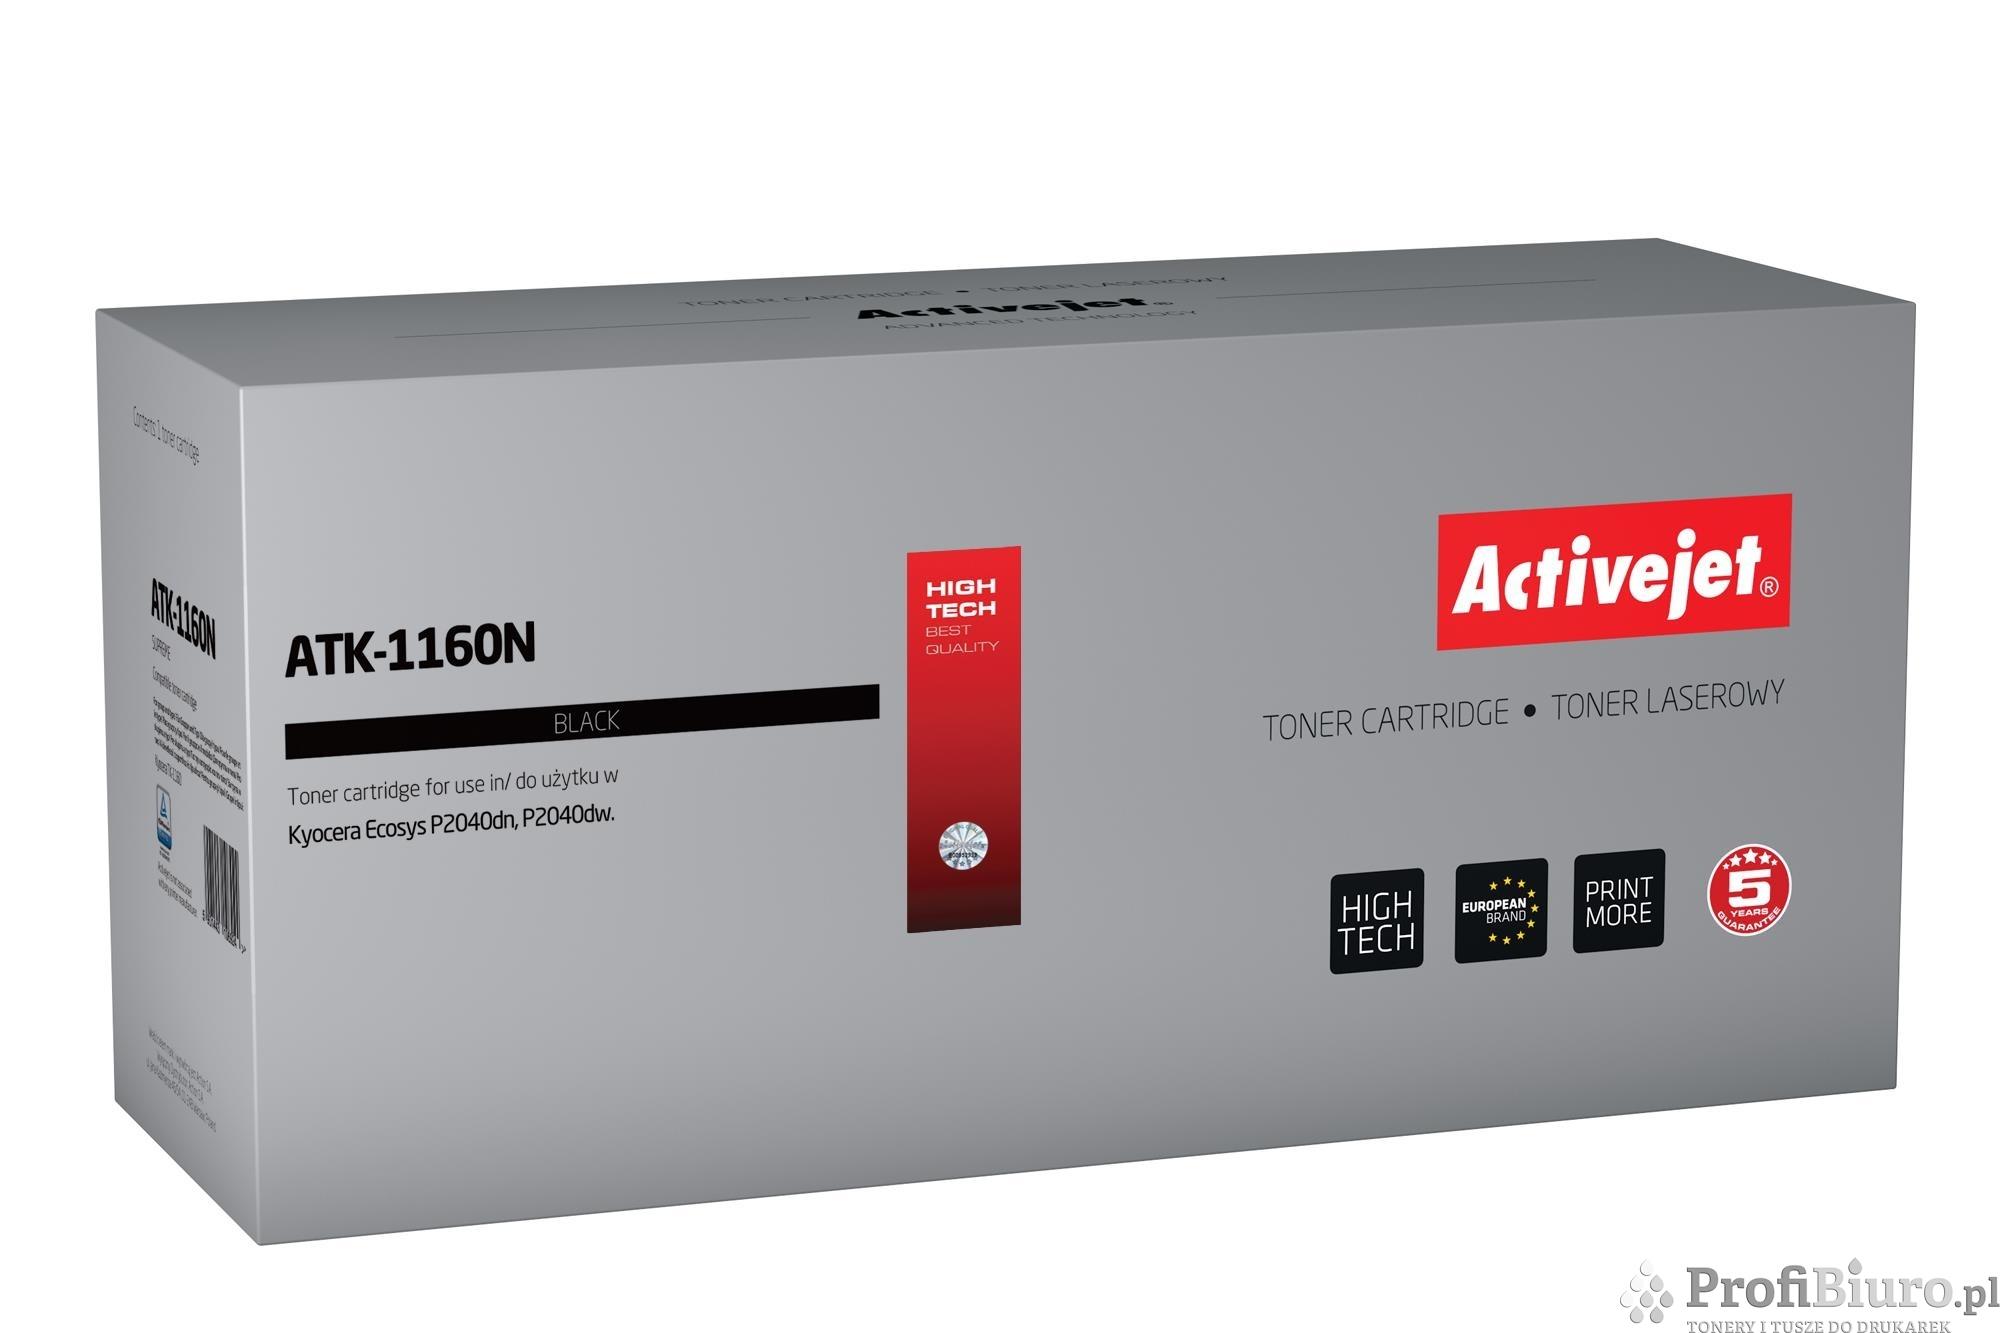 Toner Activejet ATK-1160N (zamiennik Kyocera TK-1160; Supreme; 7 200 stron; czarny)